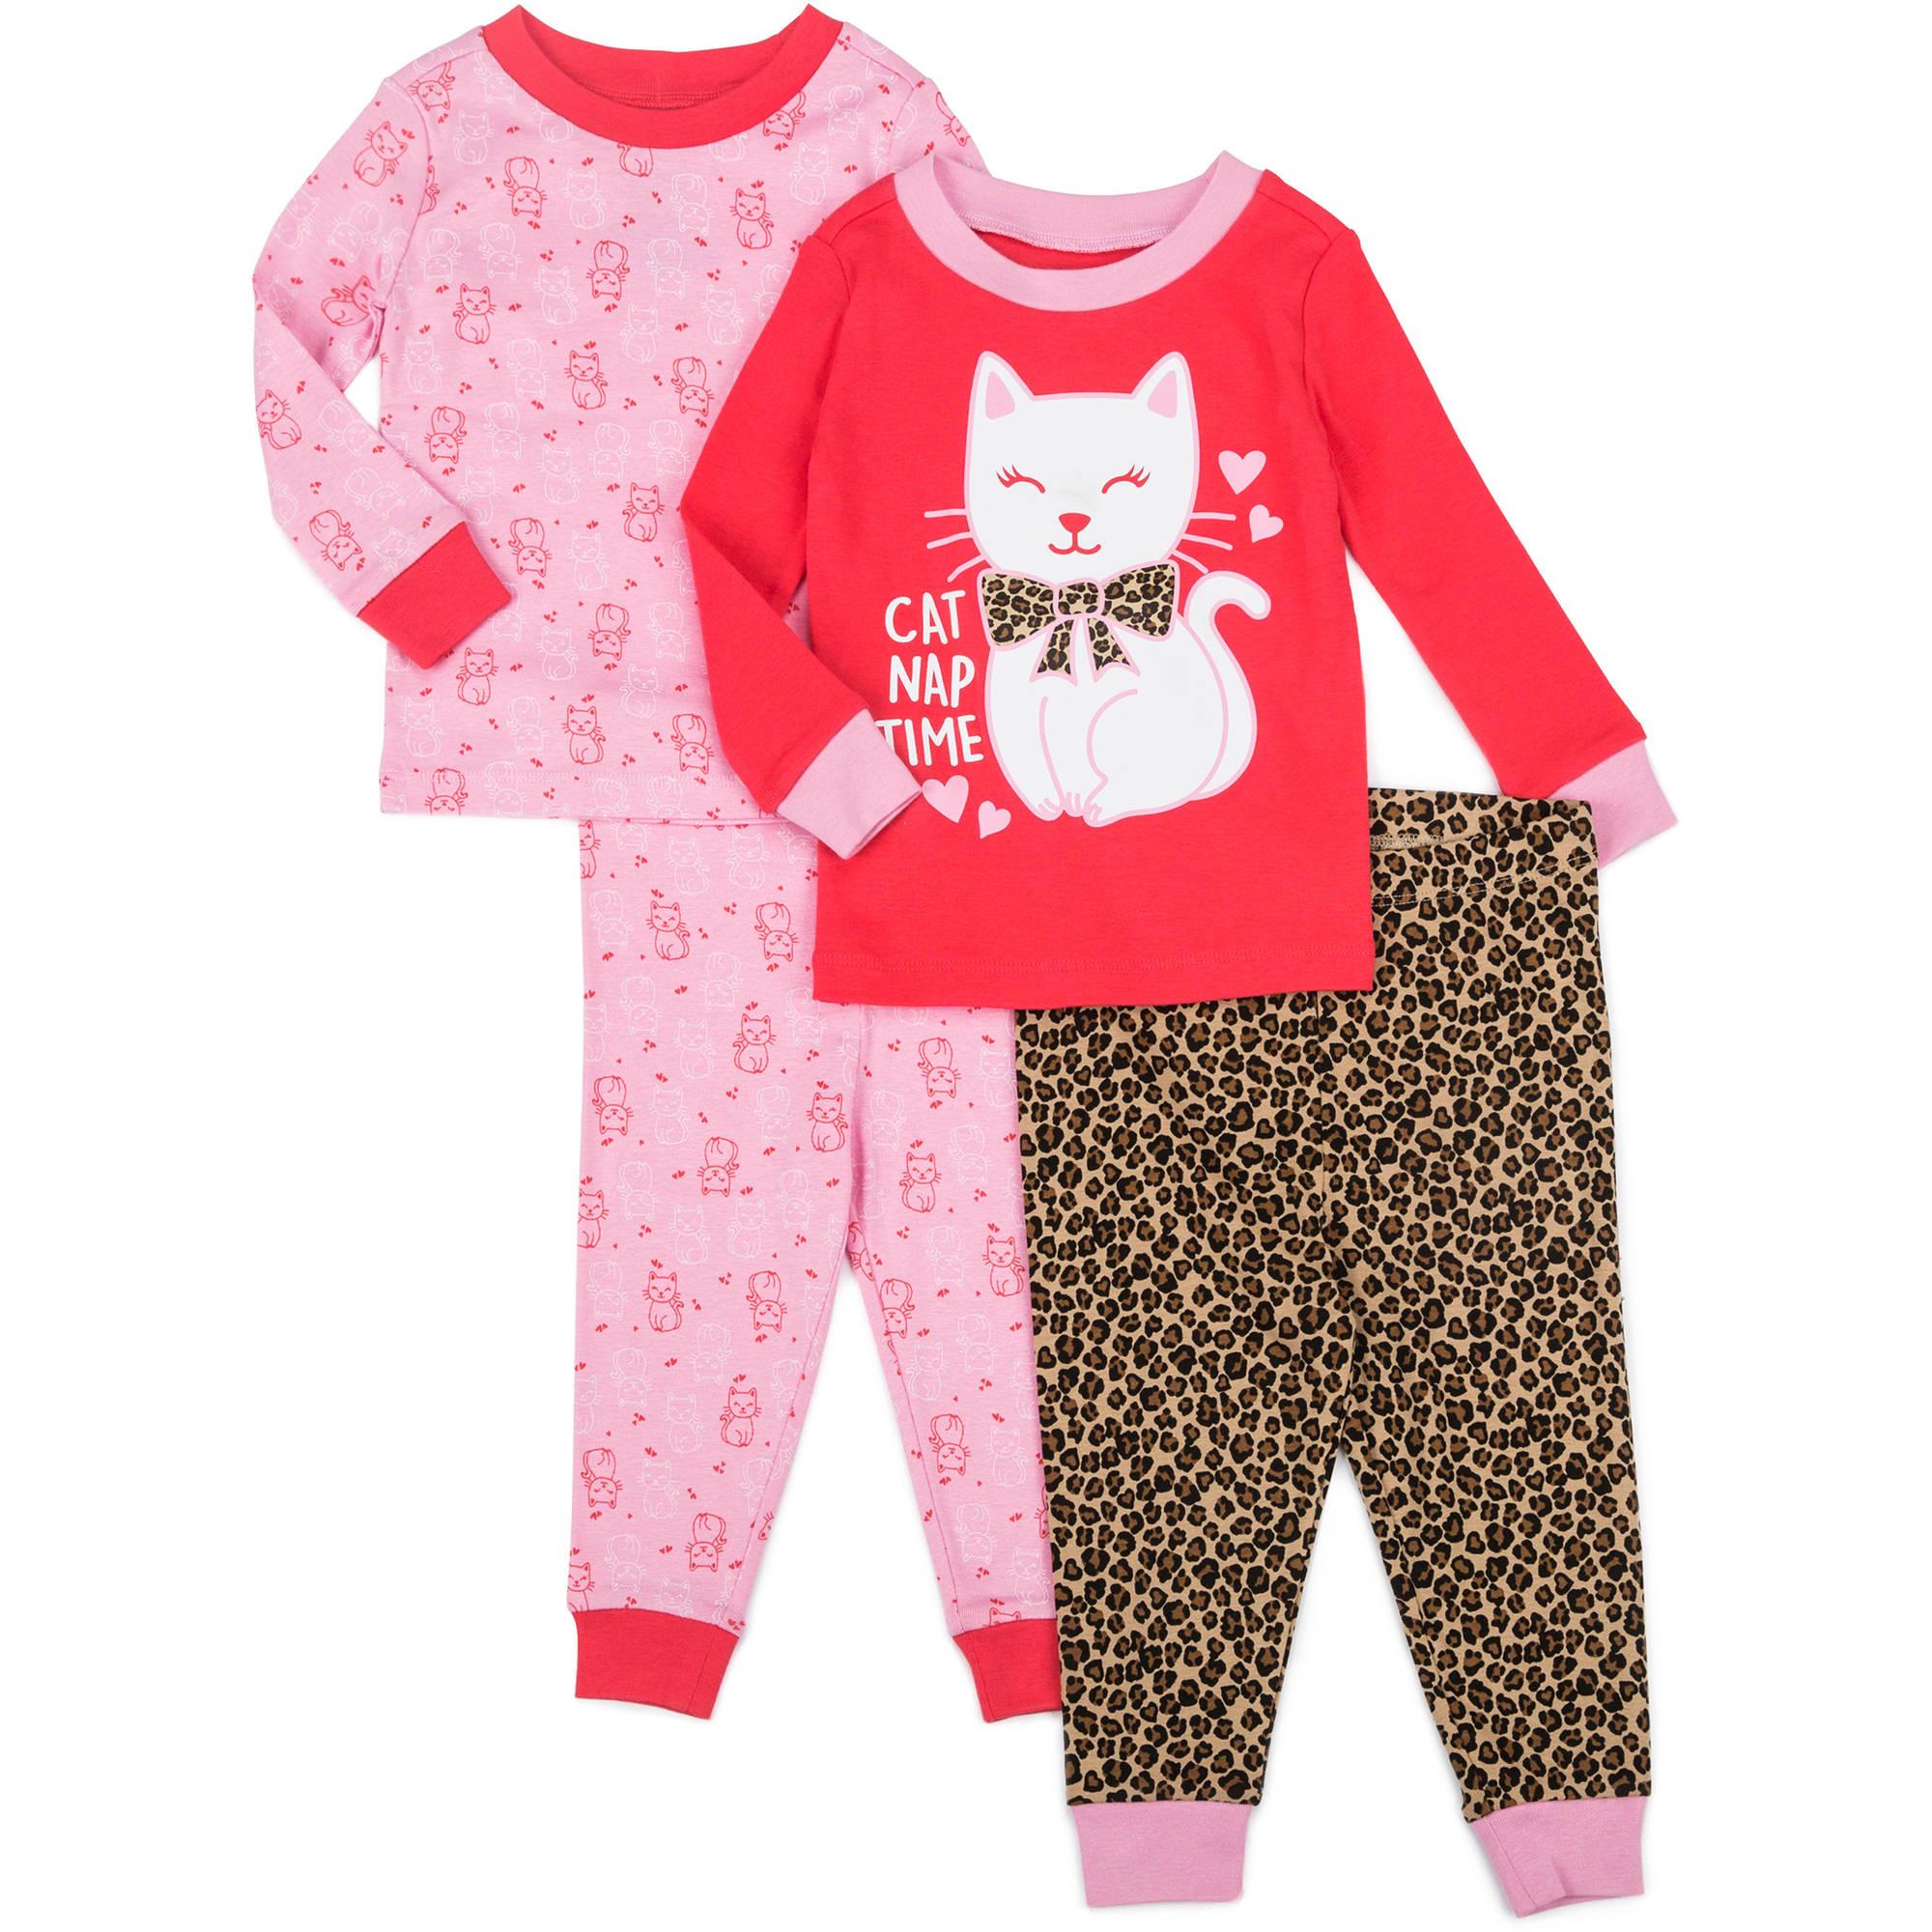 Newborn Baby Girl Tight Fit Kitten PJ 4-piece set